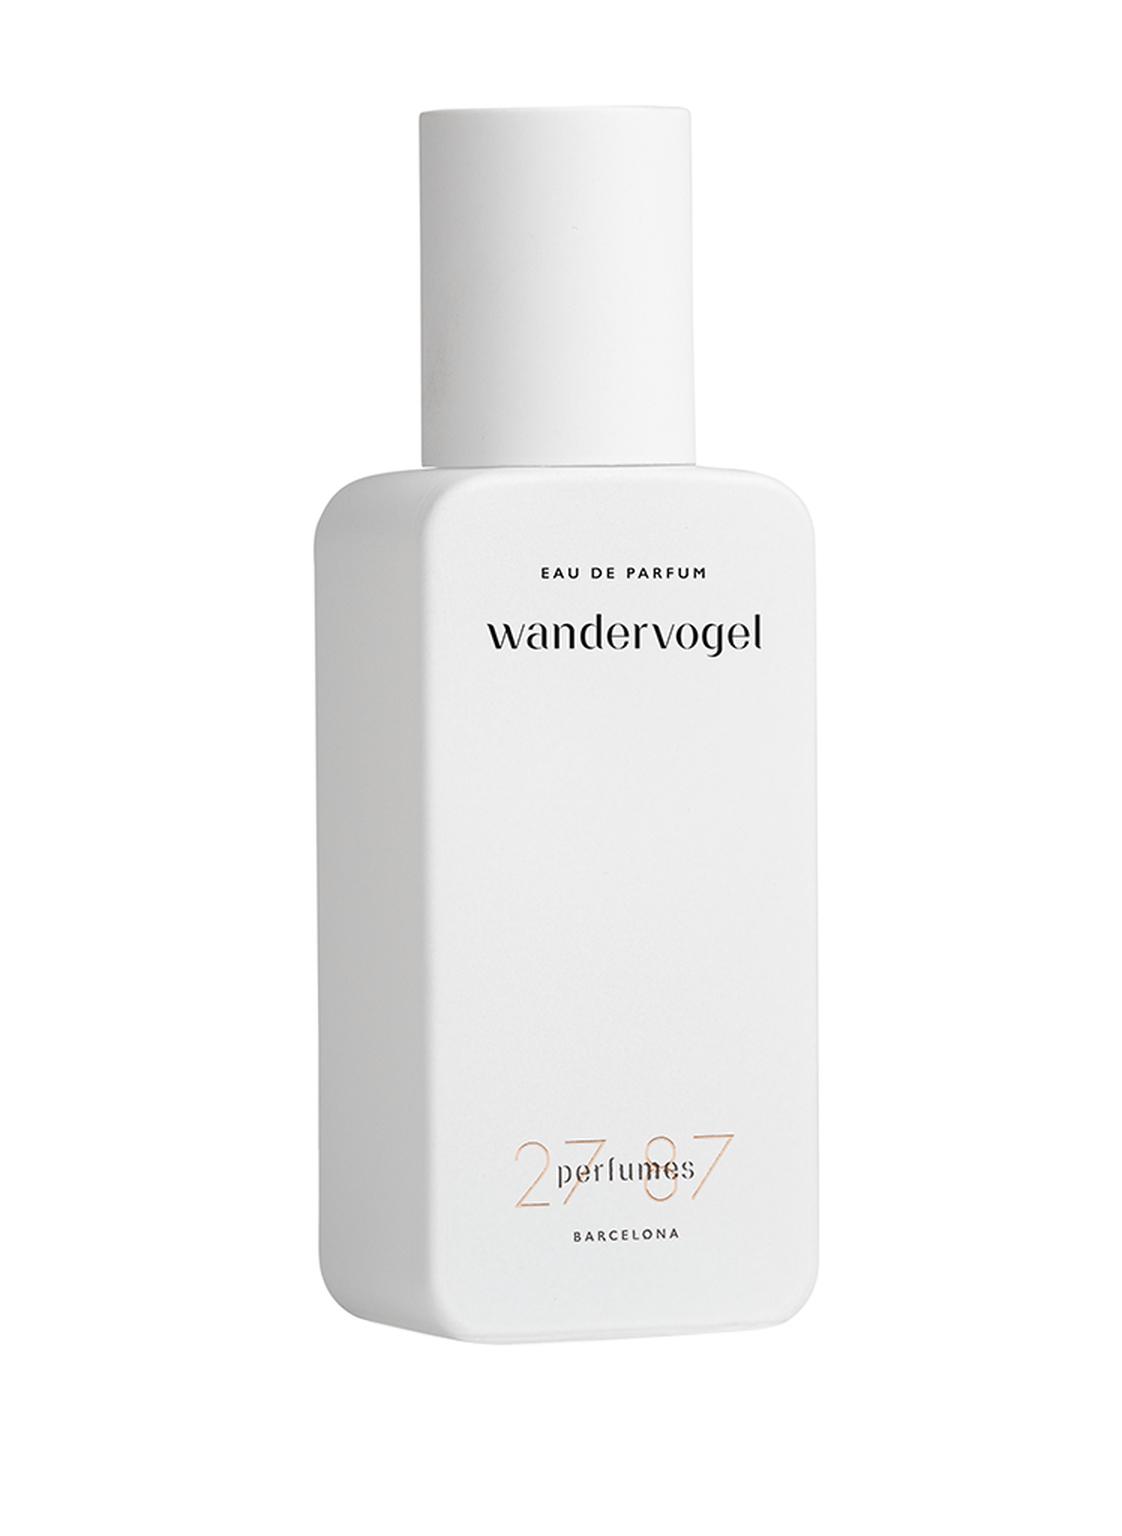 Image of 27 87 Perfumes Wandervogel Eau de Parfum 27 ml